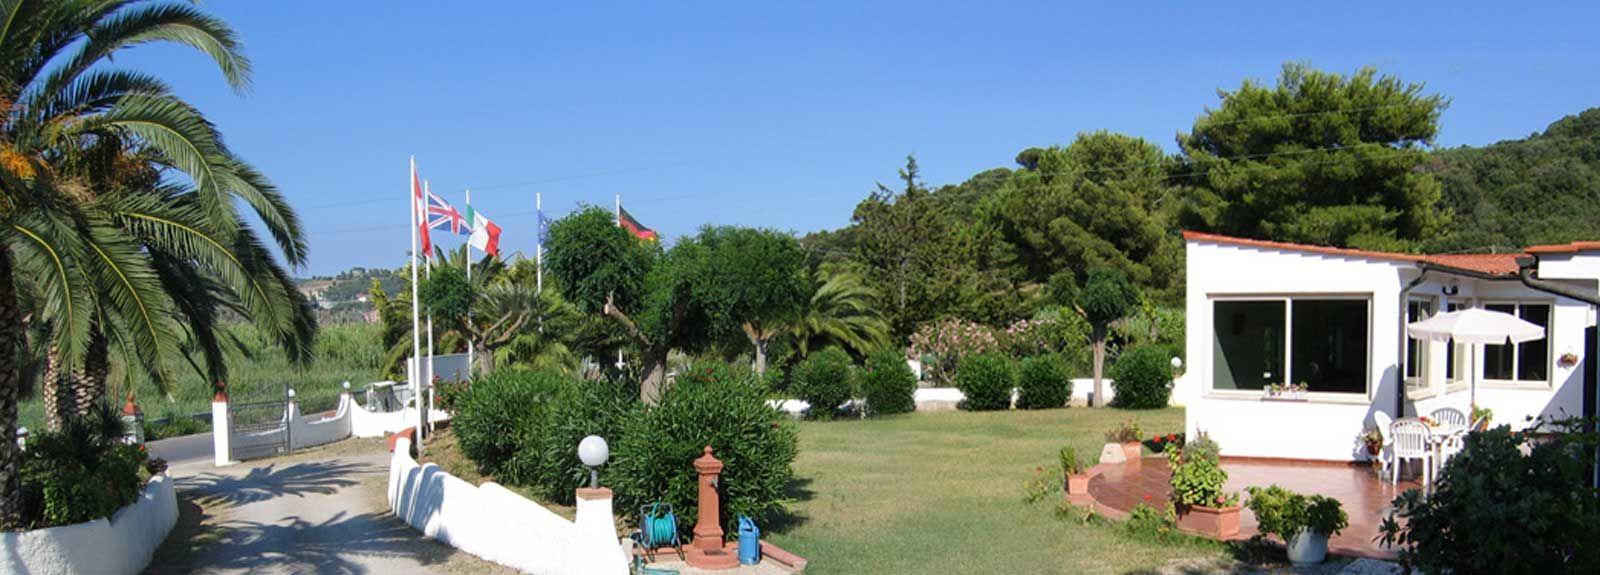 Residence Baia Azzurra Capoliveri Isola D Elba